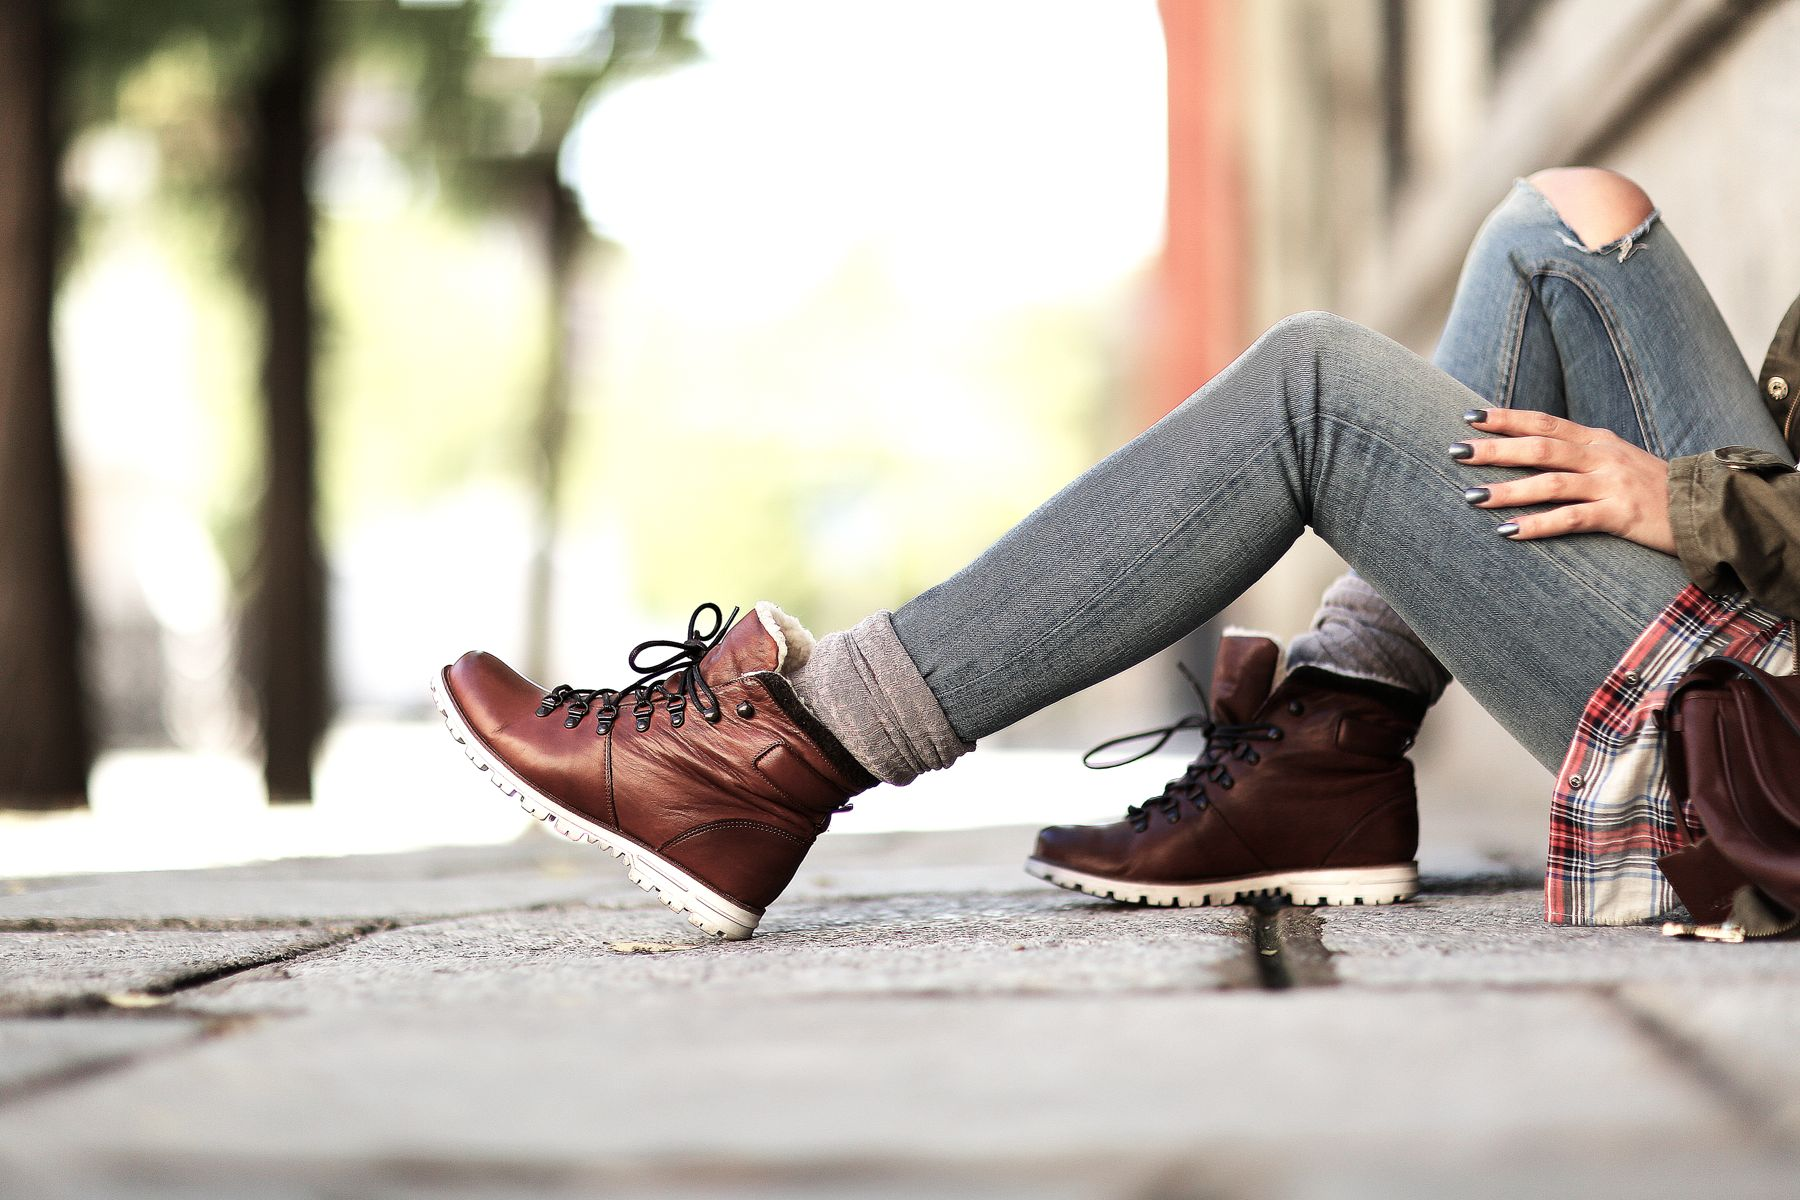 trendy-taste-look-outfit-street-style-trekking-tendencia-botas-parka-camisa-cuadros-plaid-shirt-fall-otoño-5